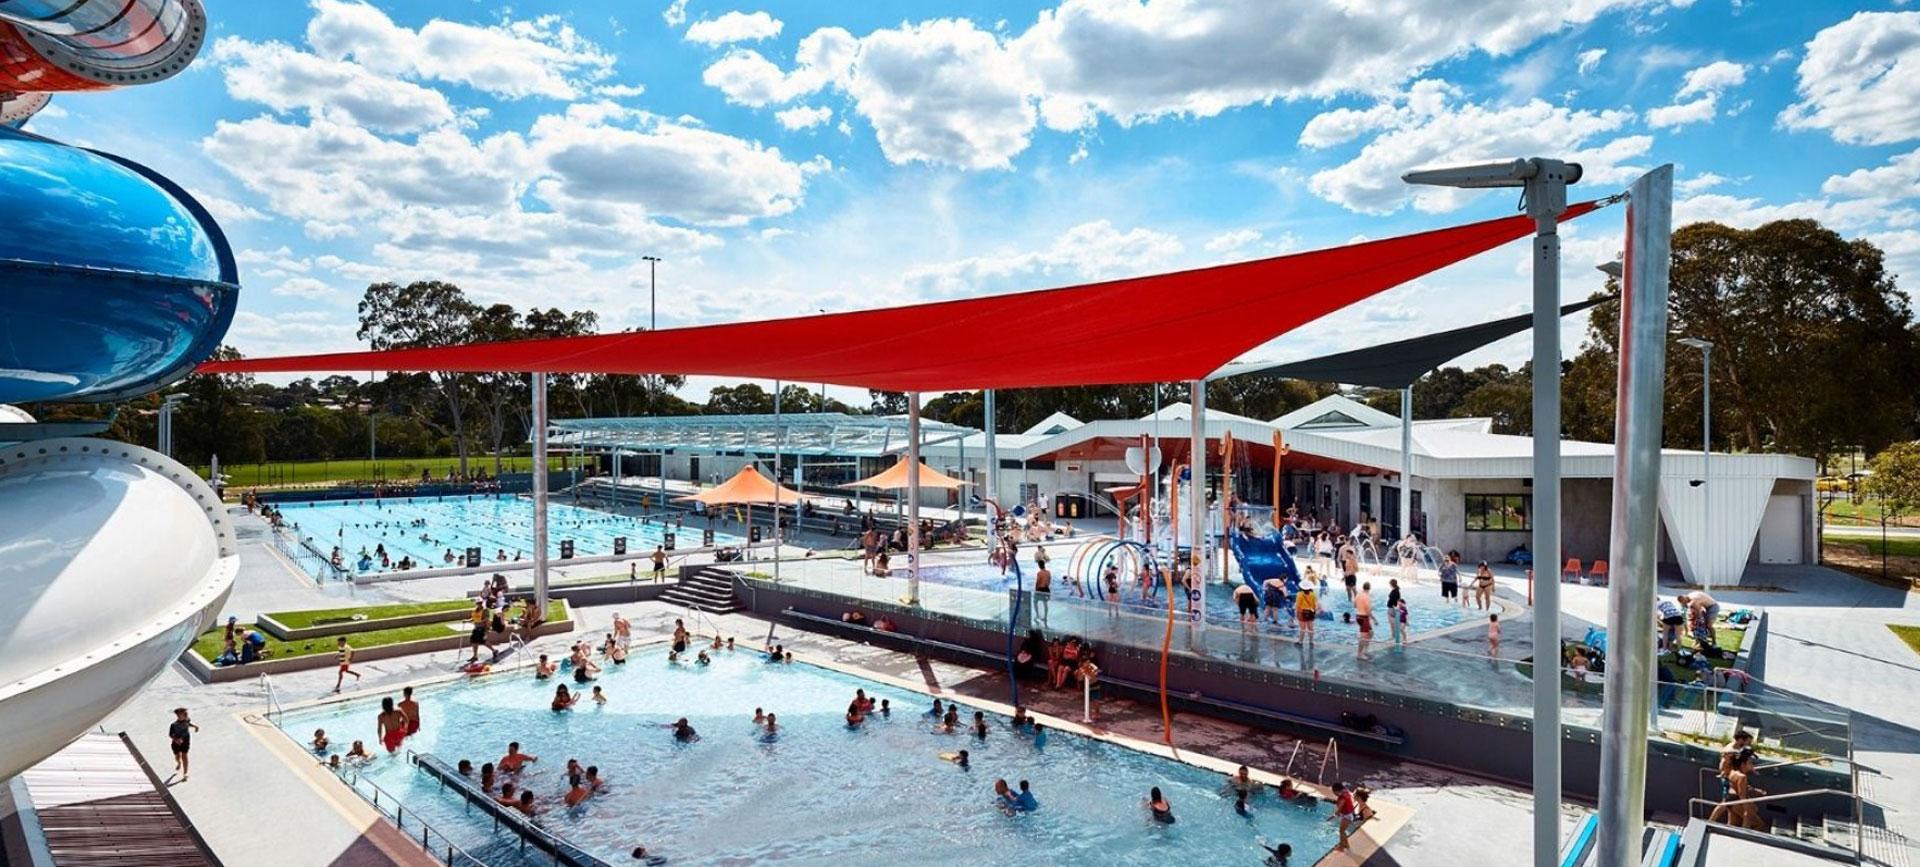 oakpark pool build